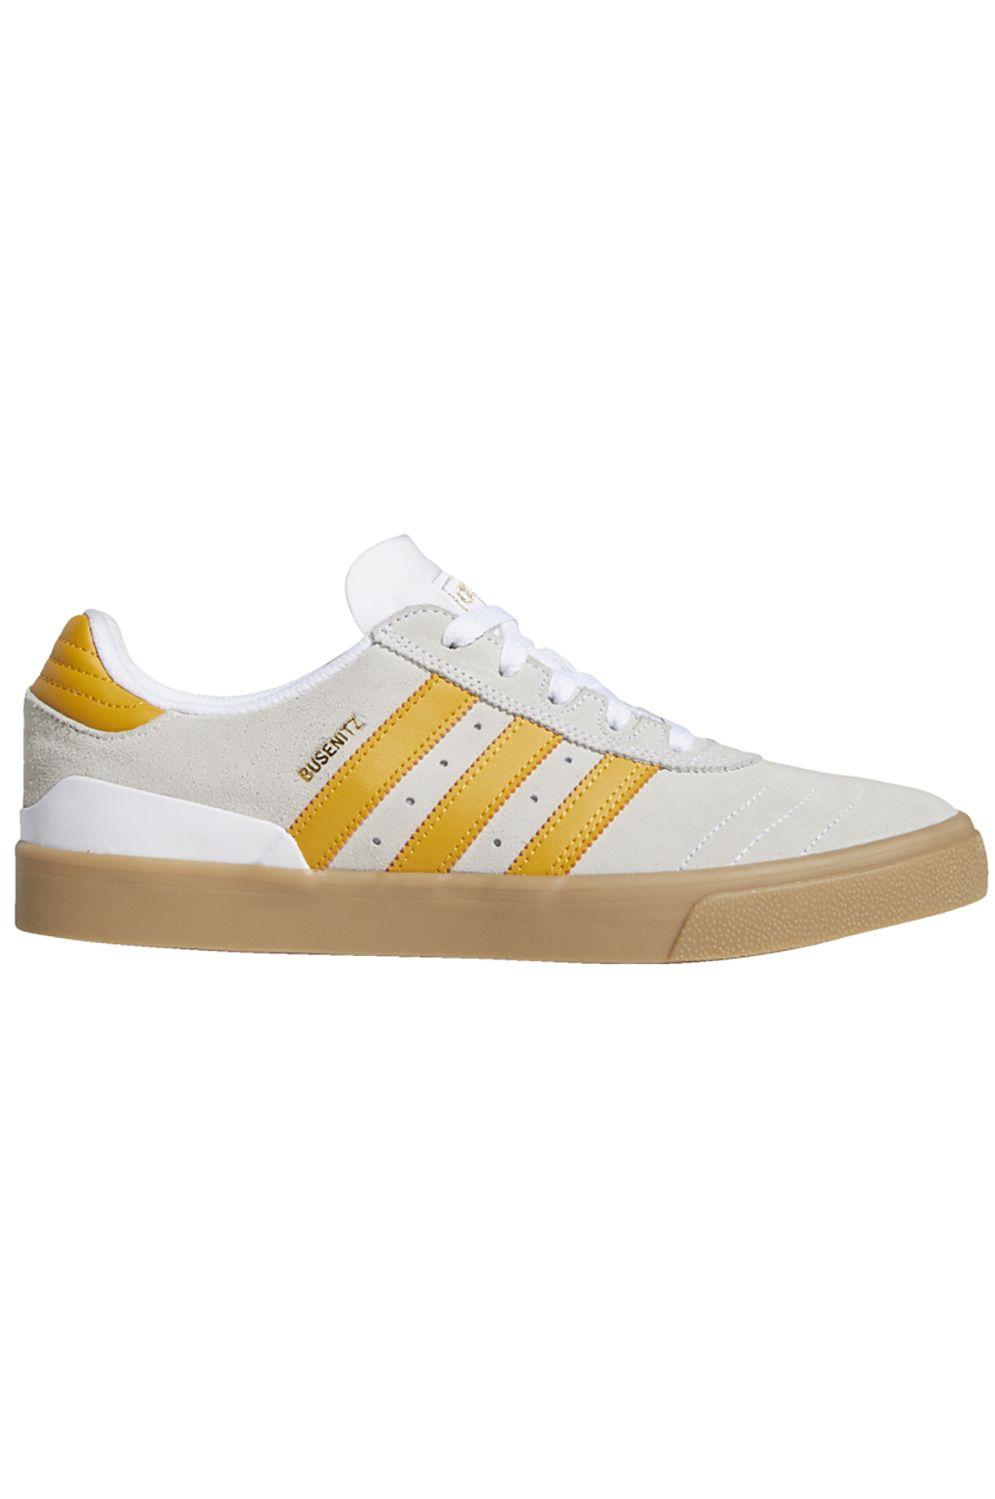 Tenis Adidas BUSENITZ VULC Ftwr White/Tactile Yellow F17/Gum4